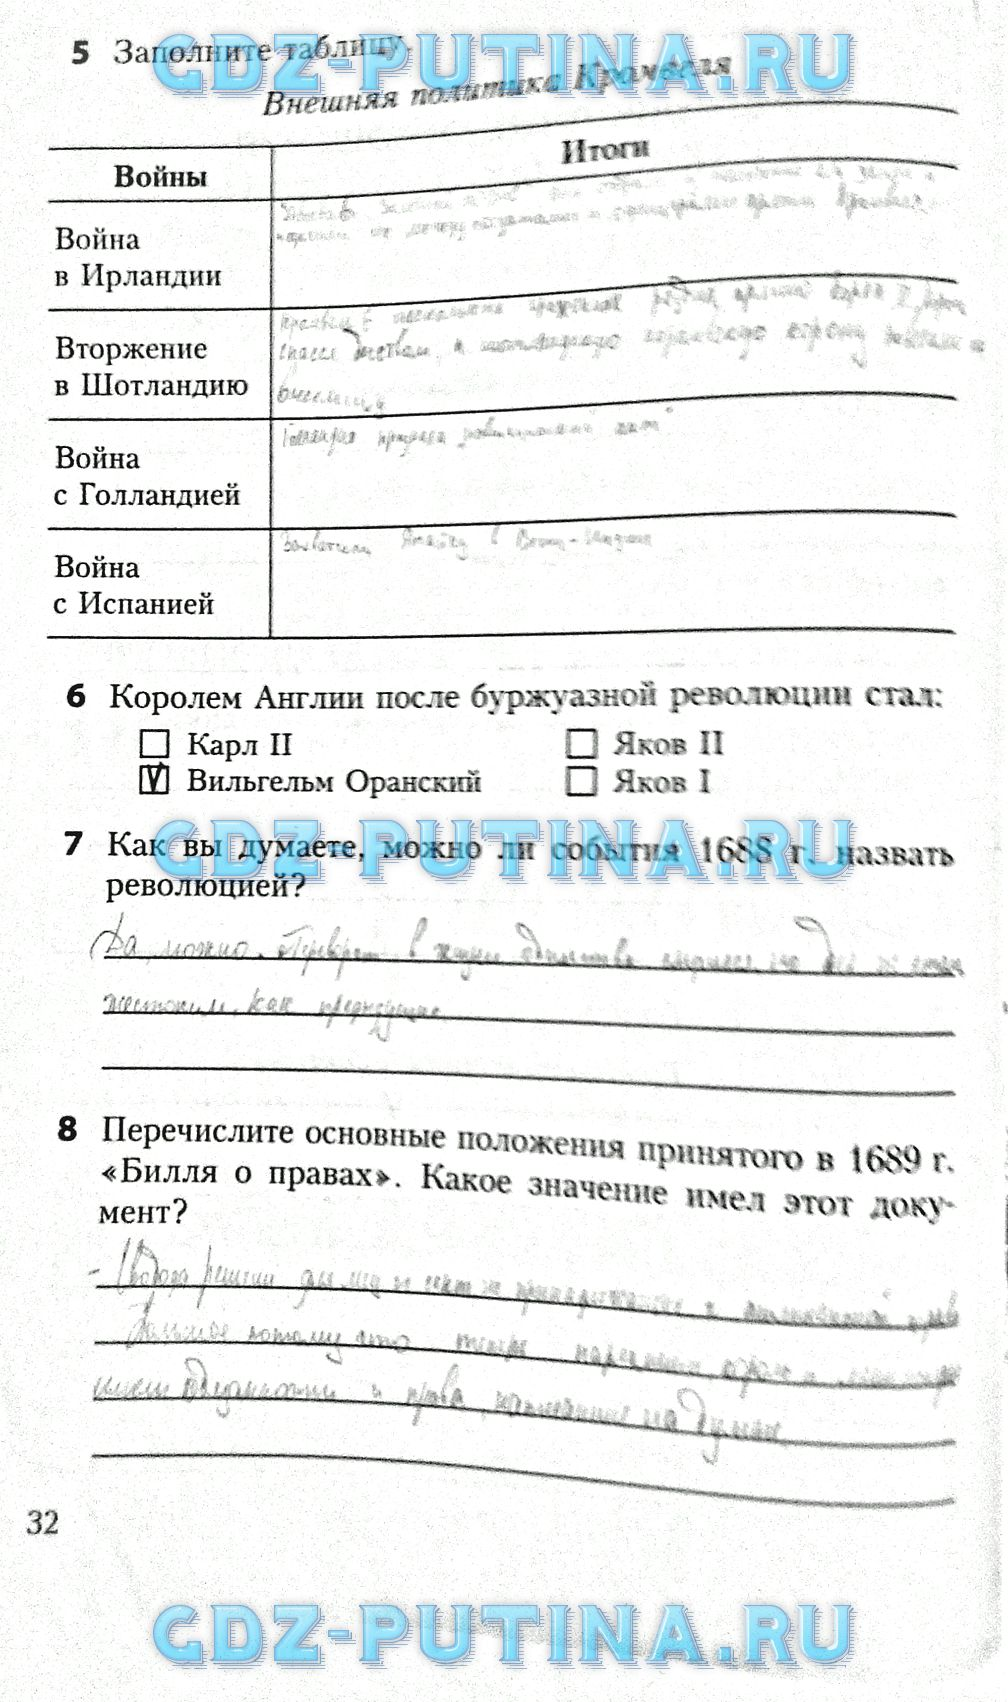 решебник по рабочим тетрадям по истории беларуси 8 класс